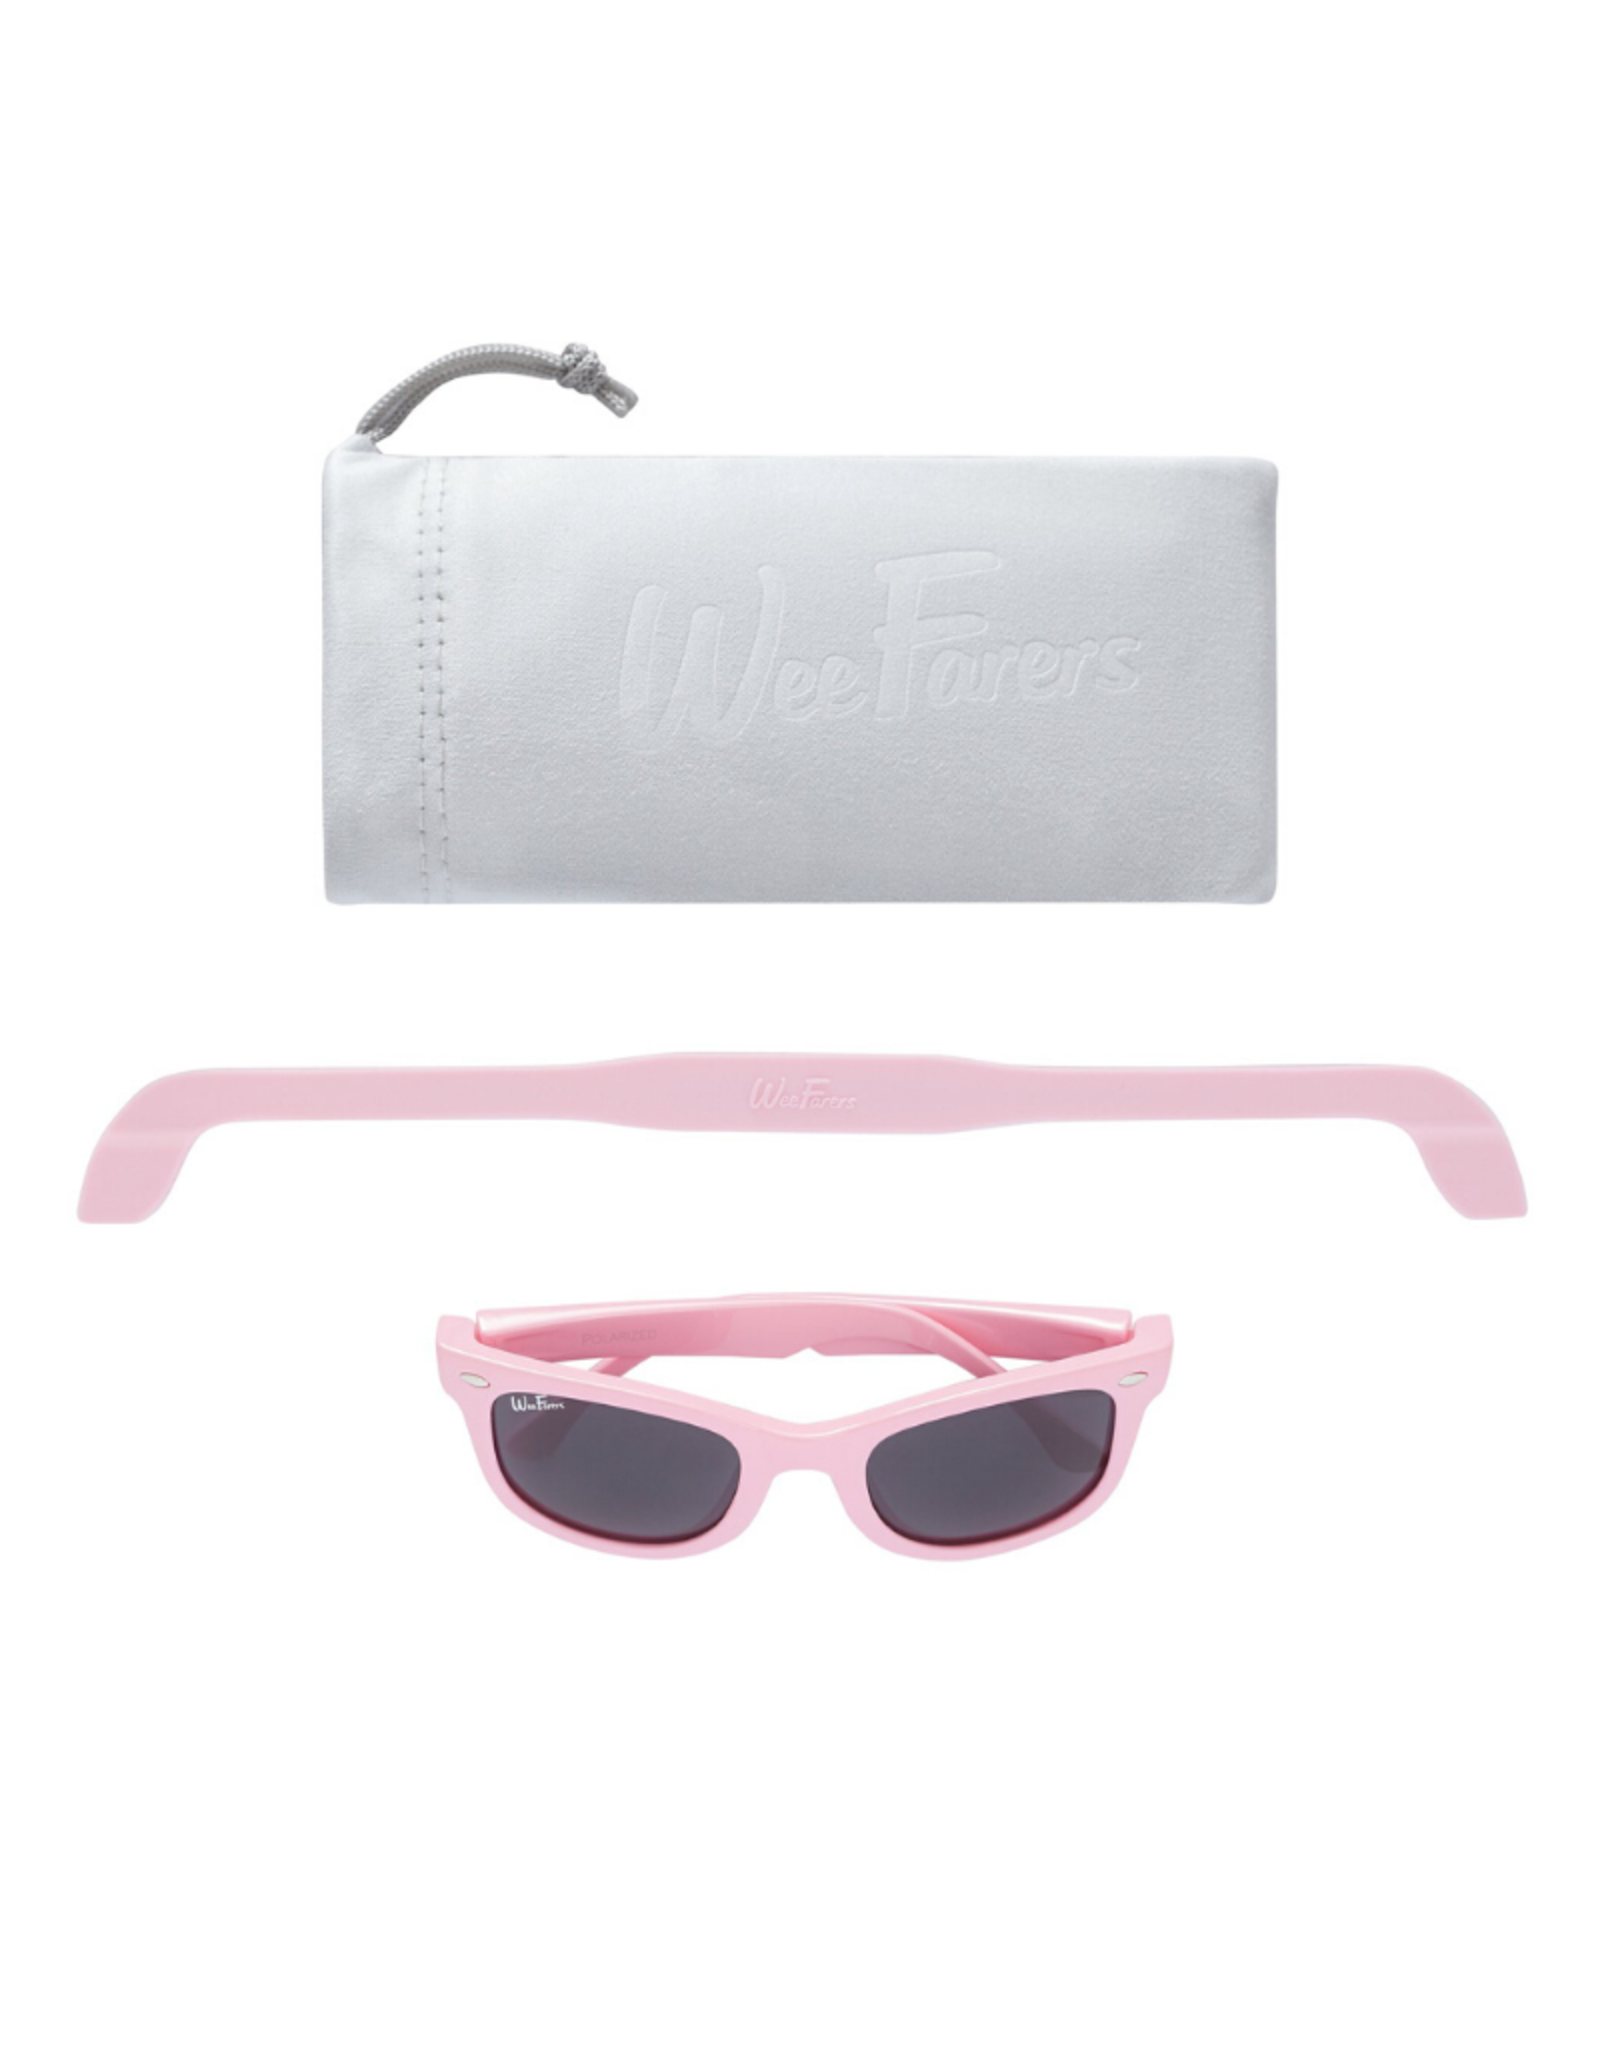 WeeFarers Pink Sunglasses